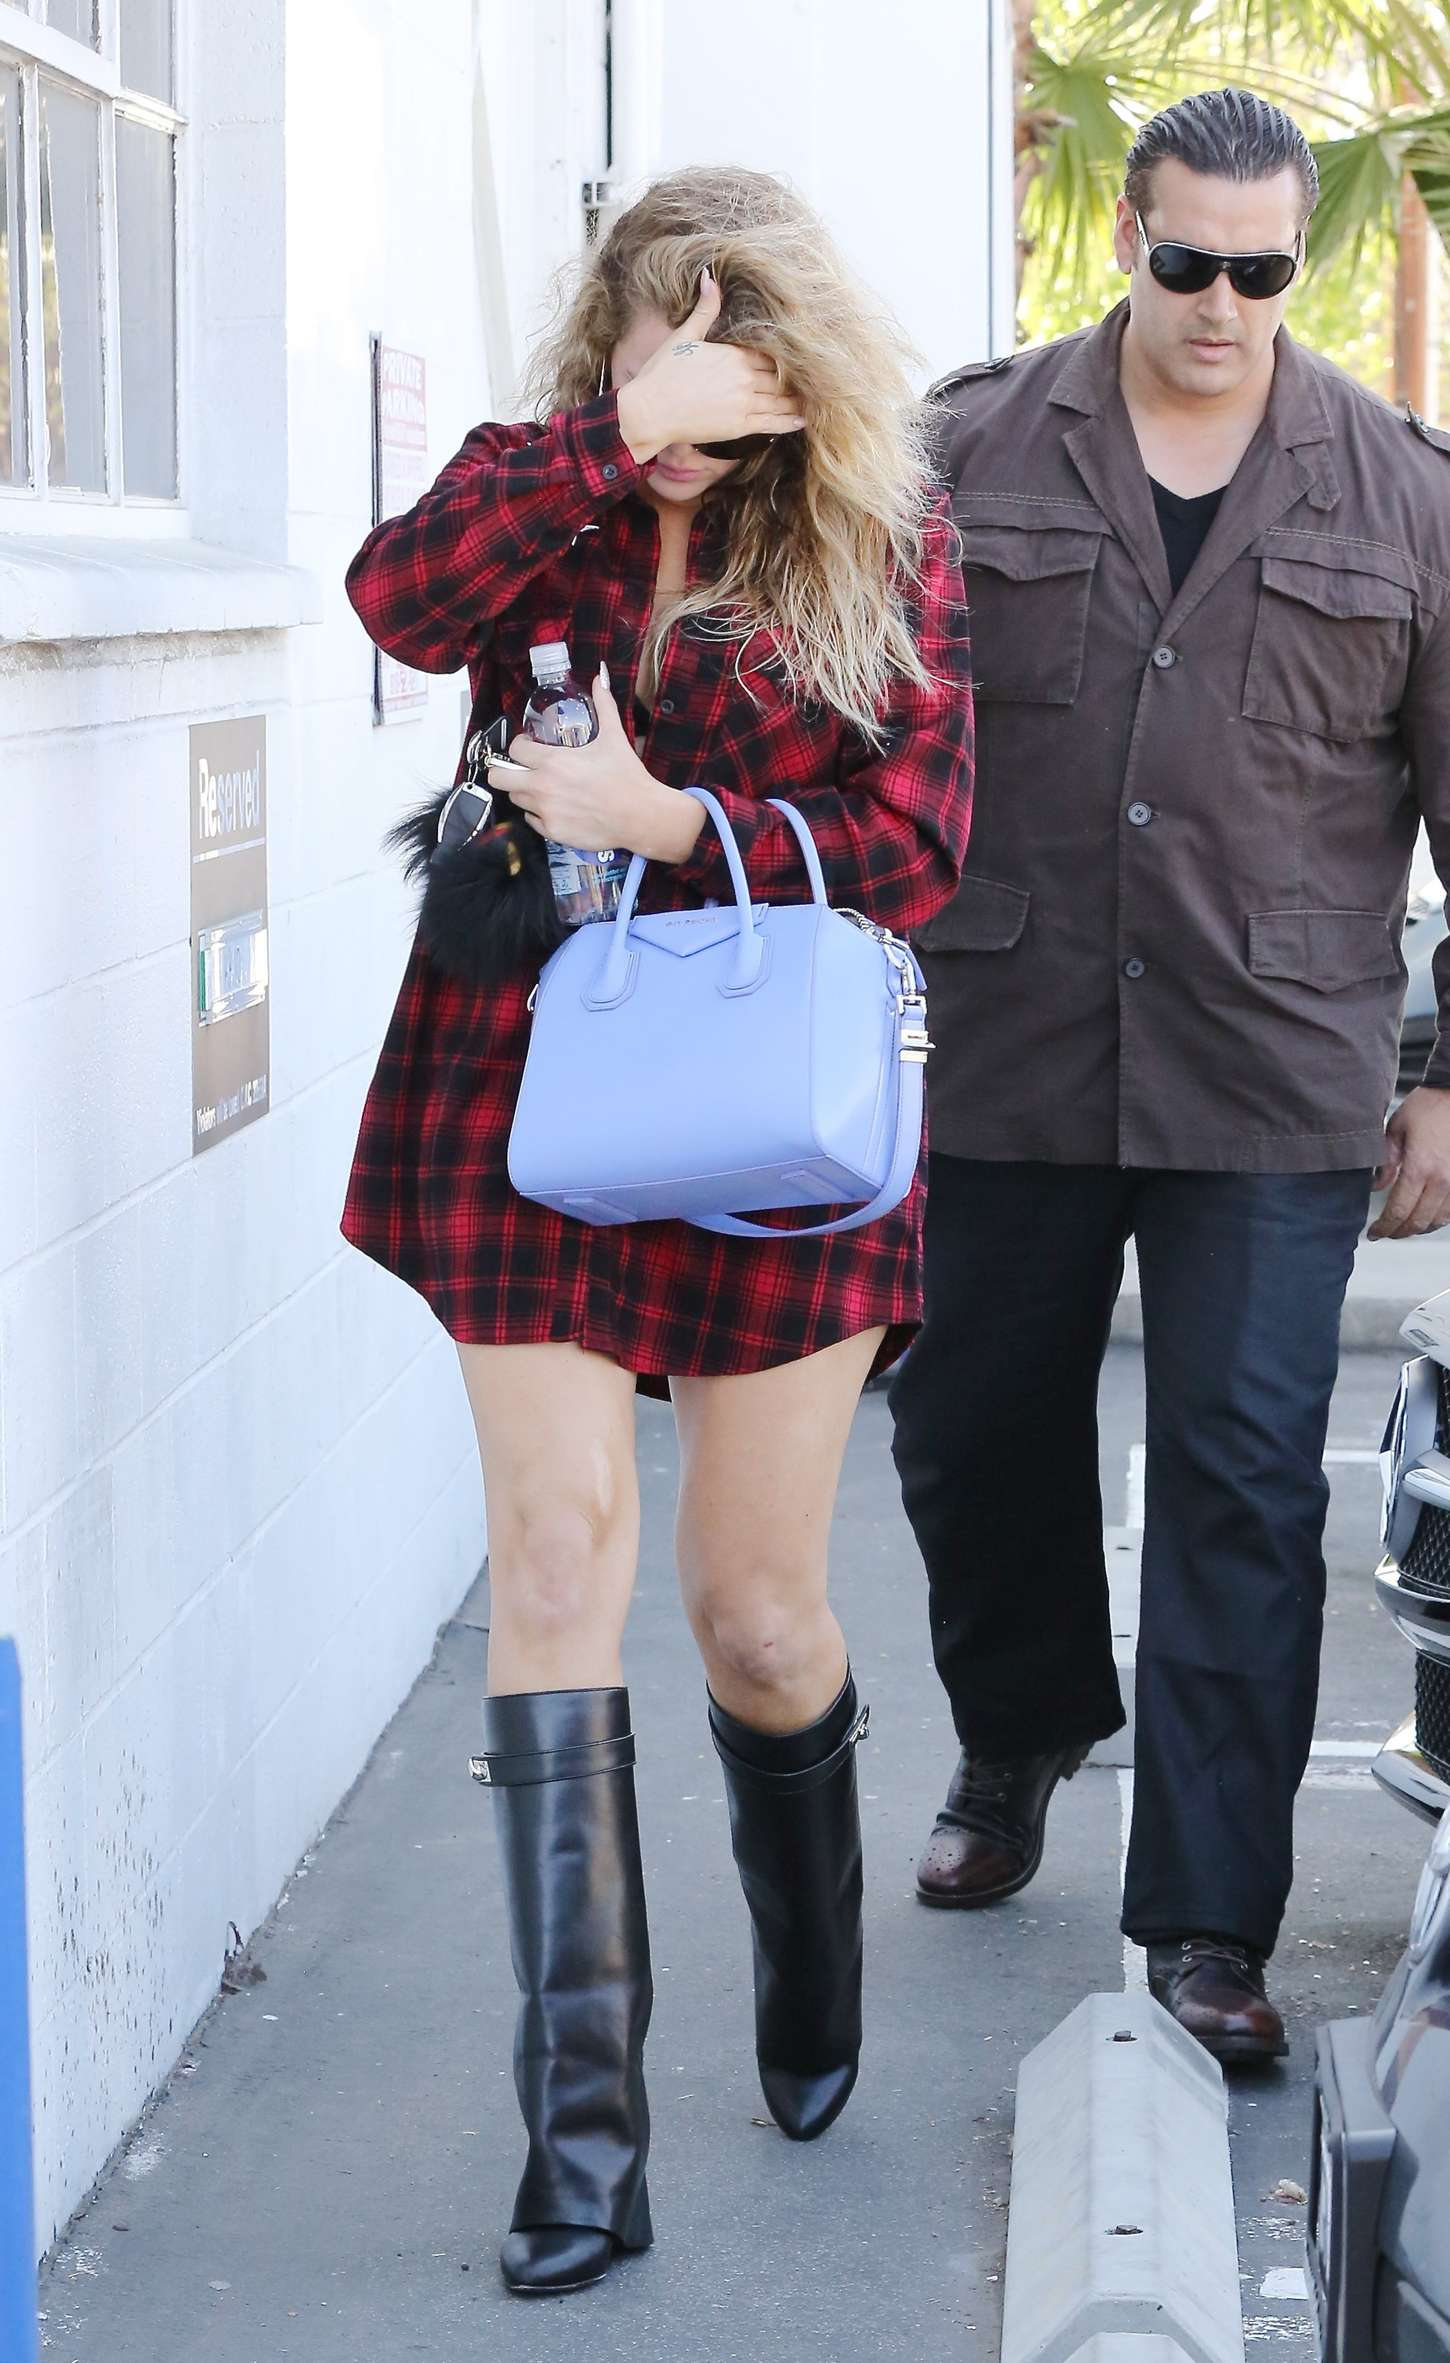 Khloe Kardashian 2015 : Khloe Kardashian in Red Shirt -03